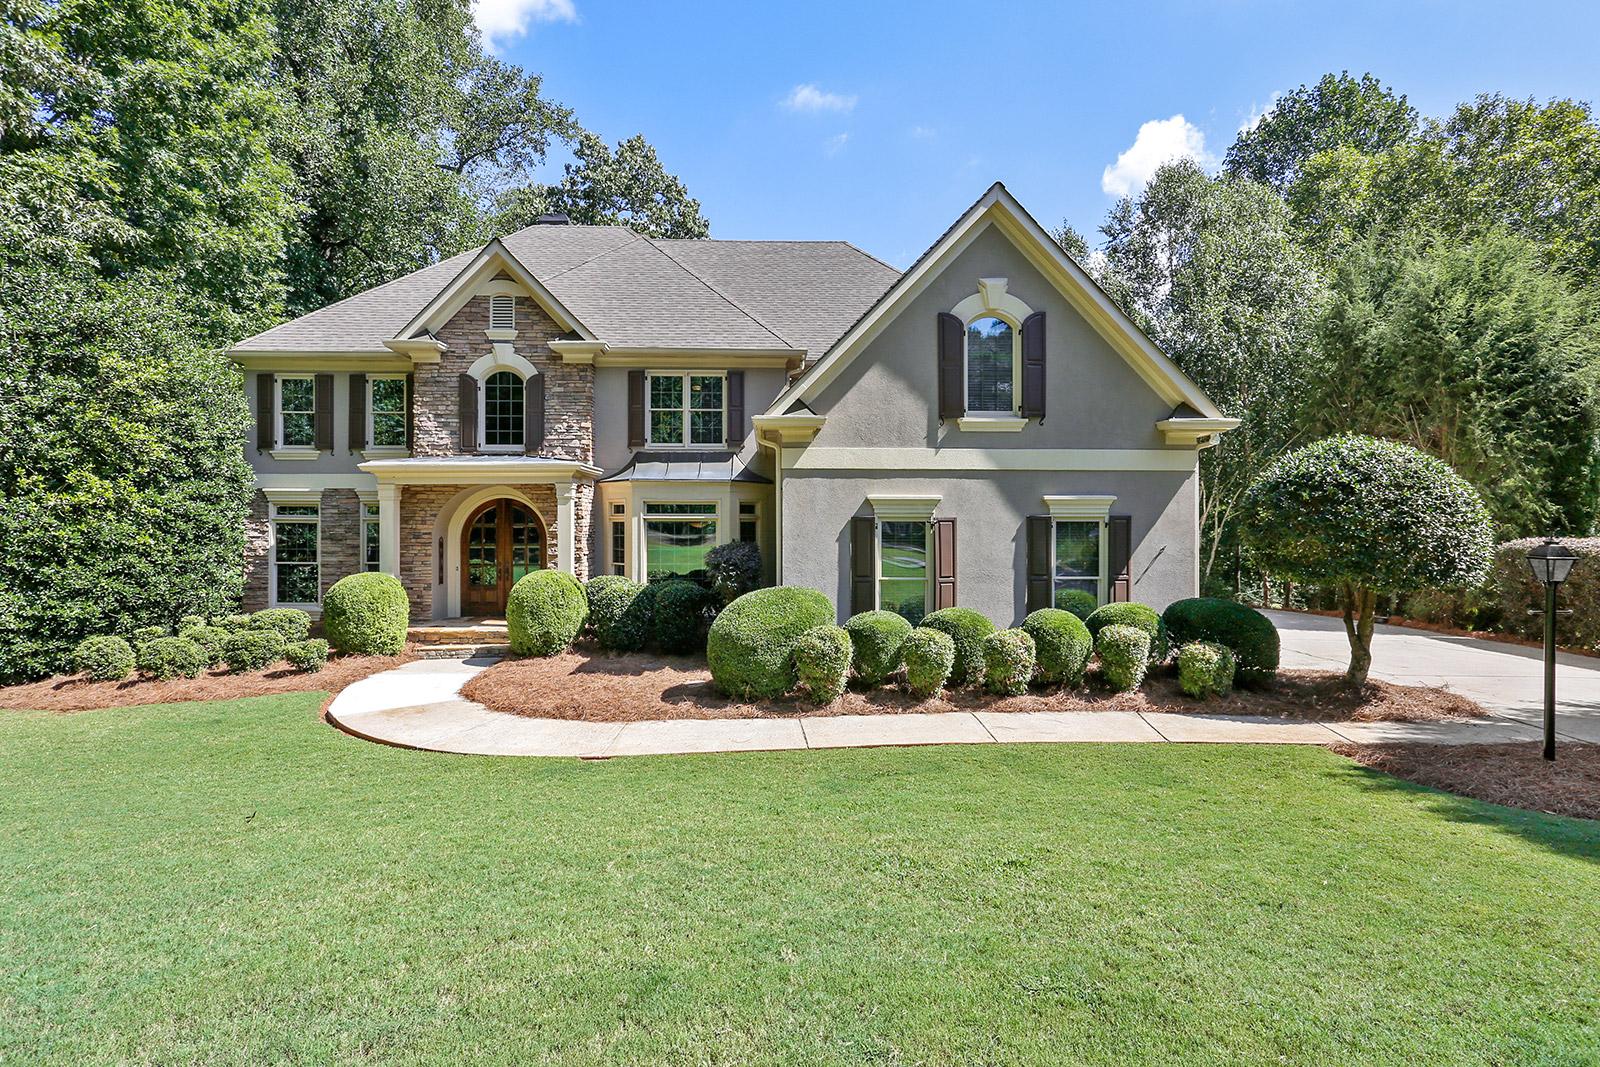 Vivienda unifamiliar por un Venta en Impeccably Maintained Home in White Columns 875 Hampton Bluff Drive Alpharetta, Georgia 30004 Estados Unidos